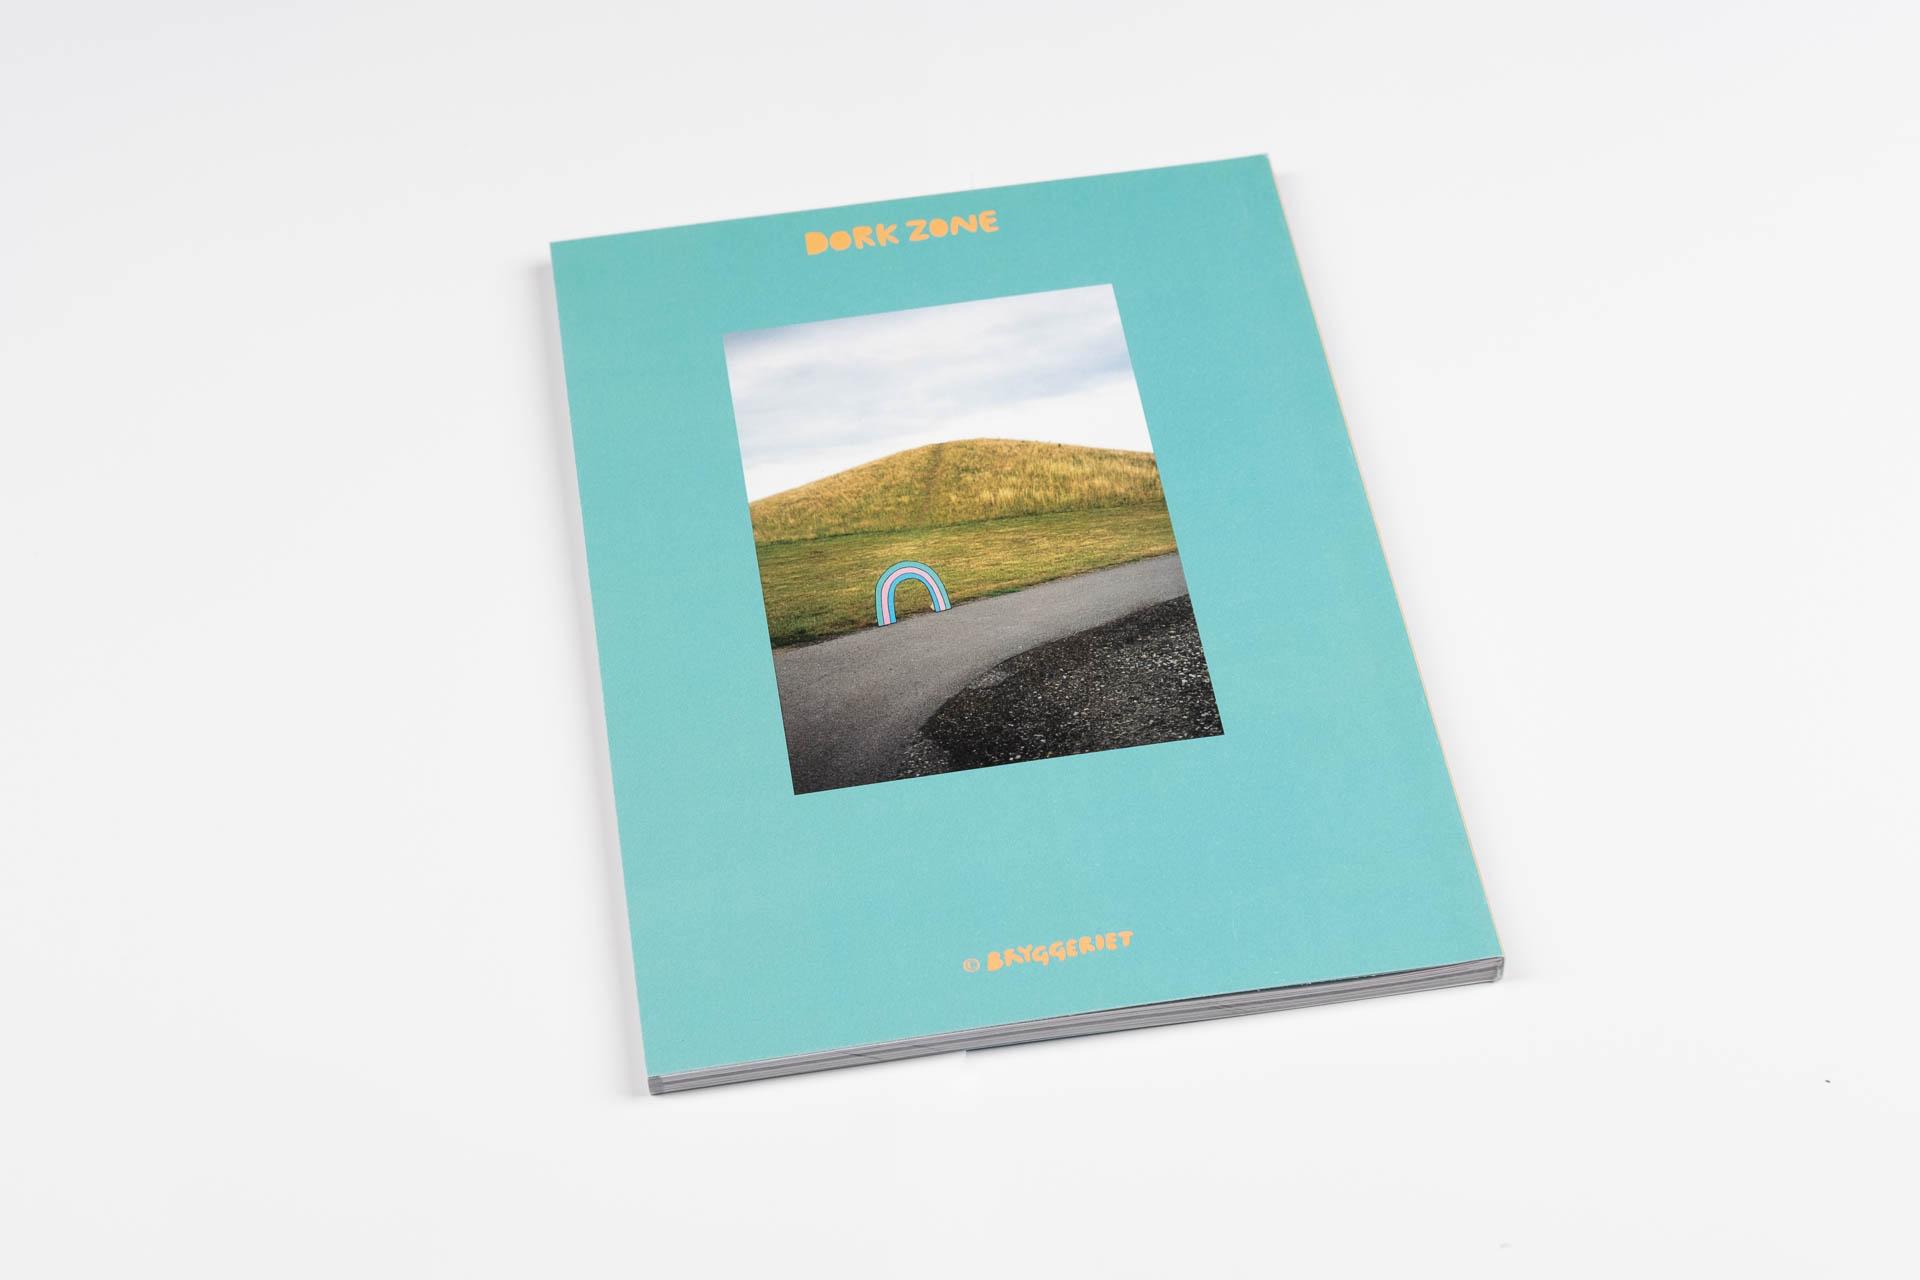 Dorkzone Book